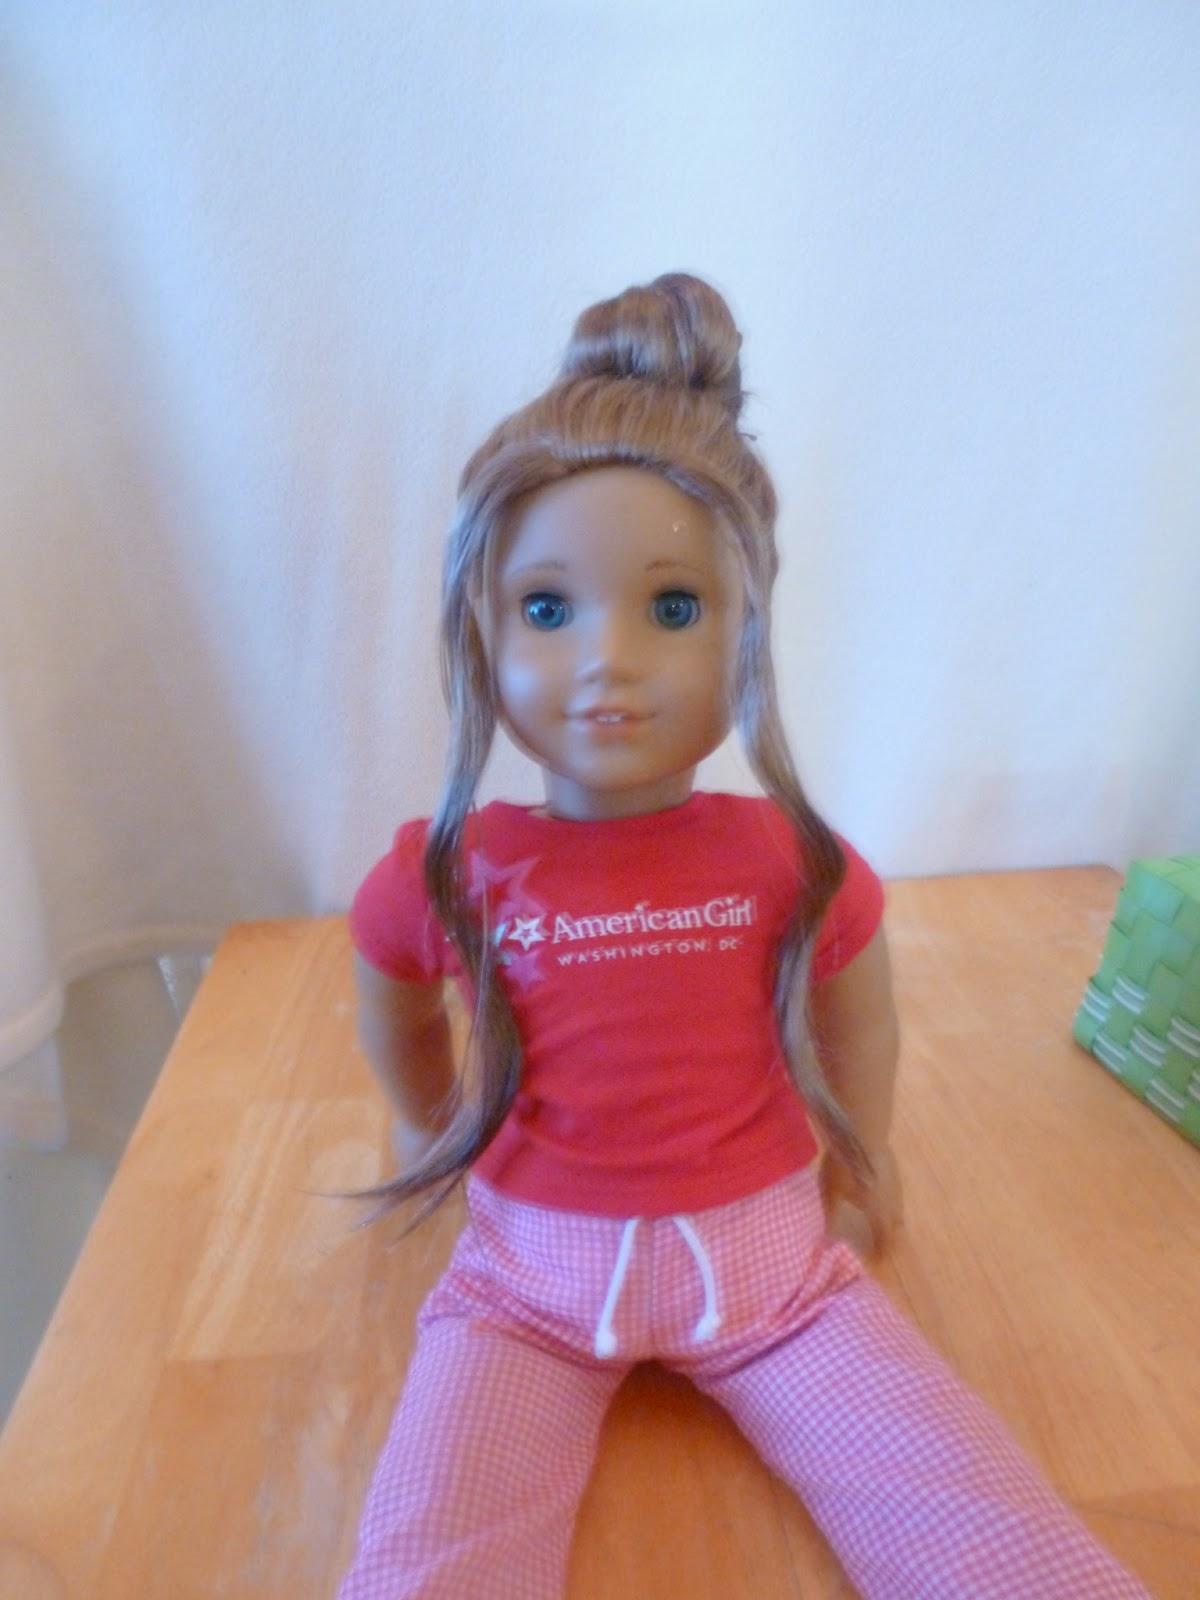 american girl doll hair. Black Bedroom Furniture Sets. Home Design Ideas